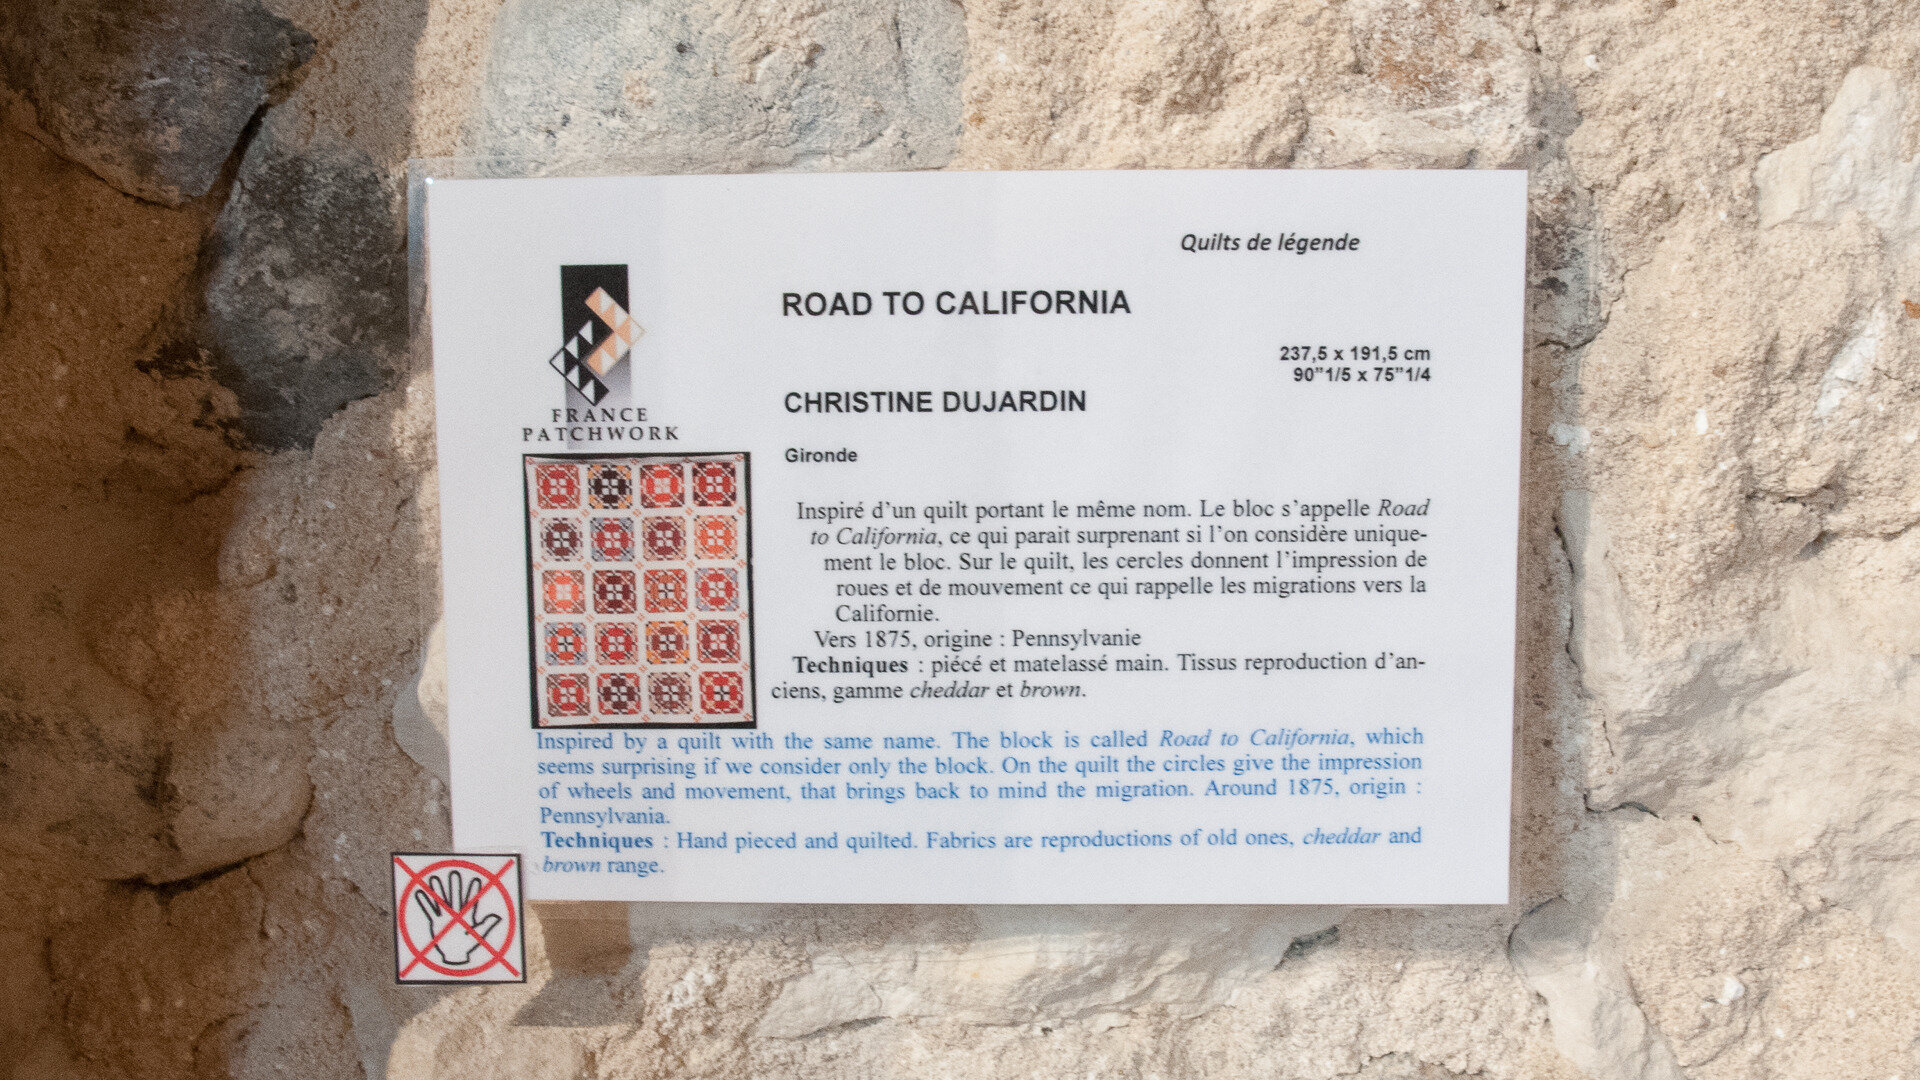 2019-04-22_14-00-17-Quilt de légende-Christine DUJARDIN-ROAD TO CALIFORNIA